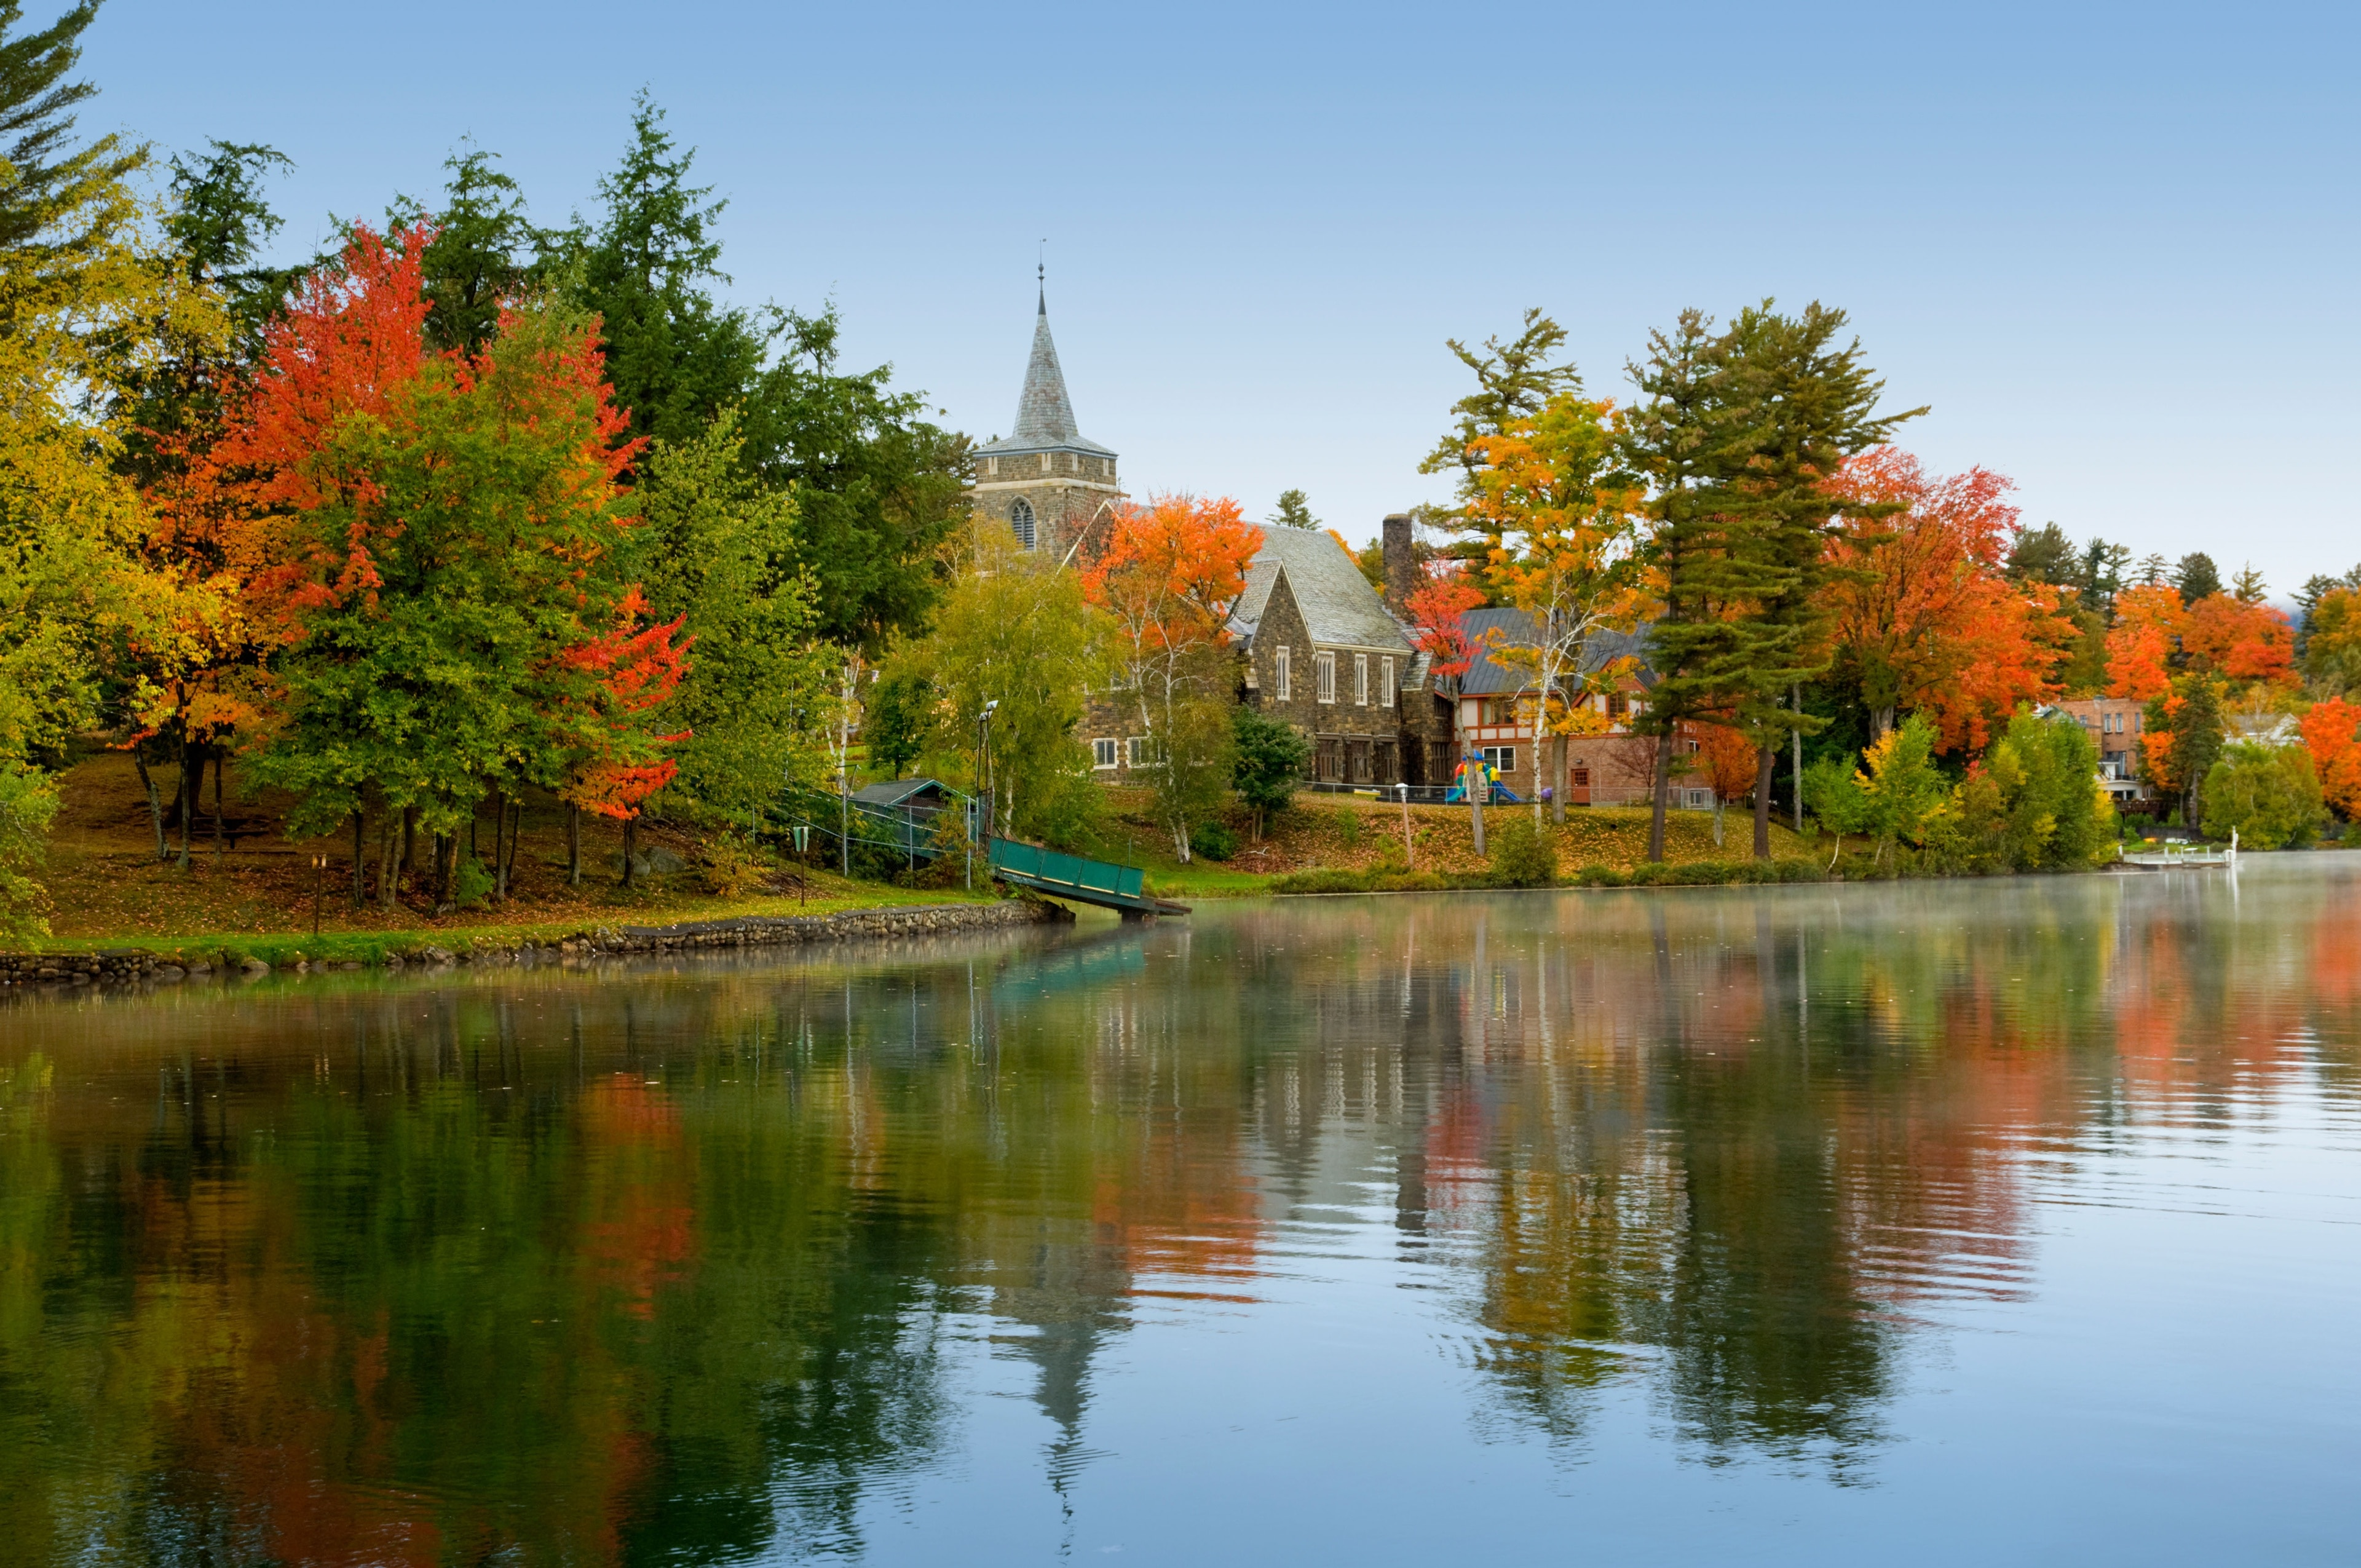 Lake Placid, New York, United States of America